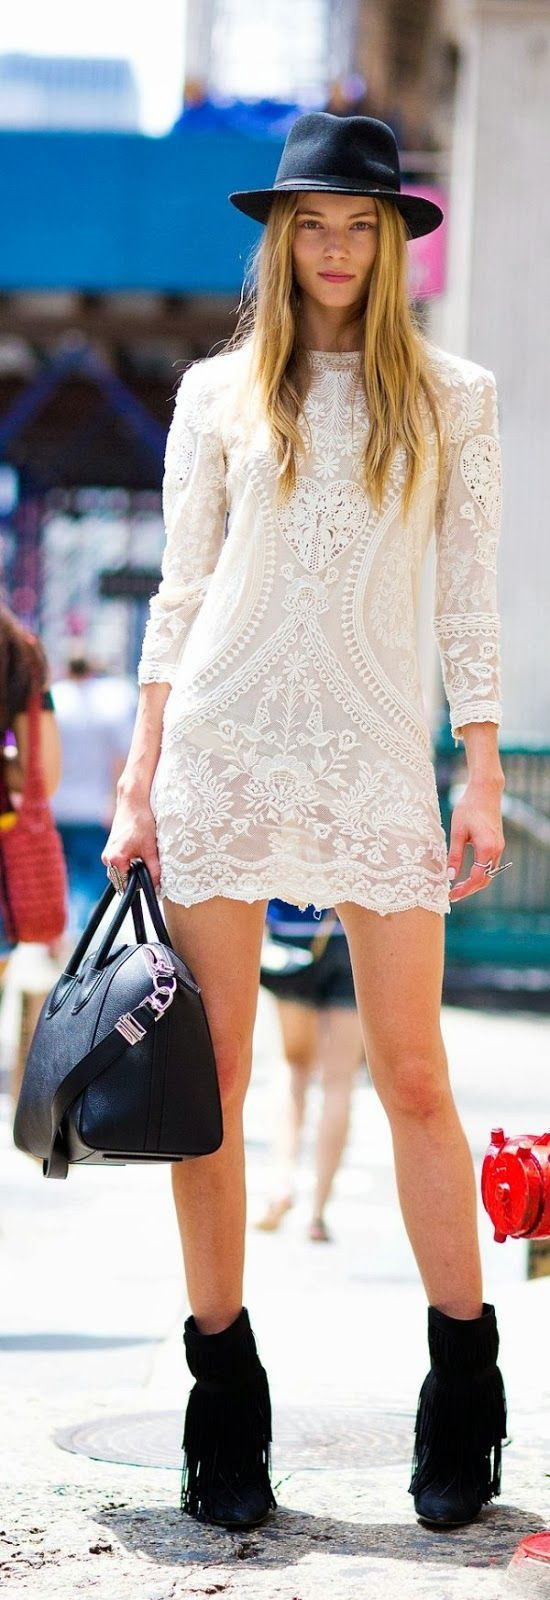 White dress boots - Ecstasy Models White Lace Dressesmini